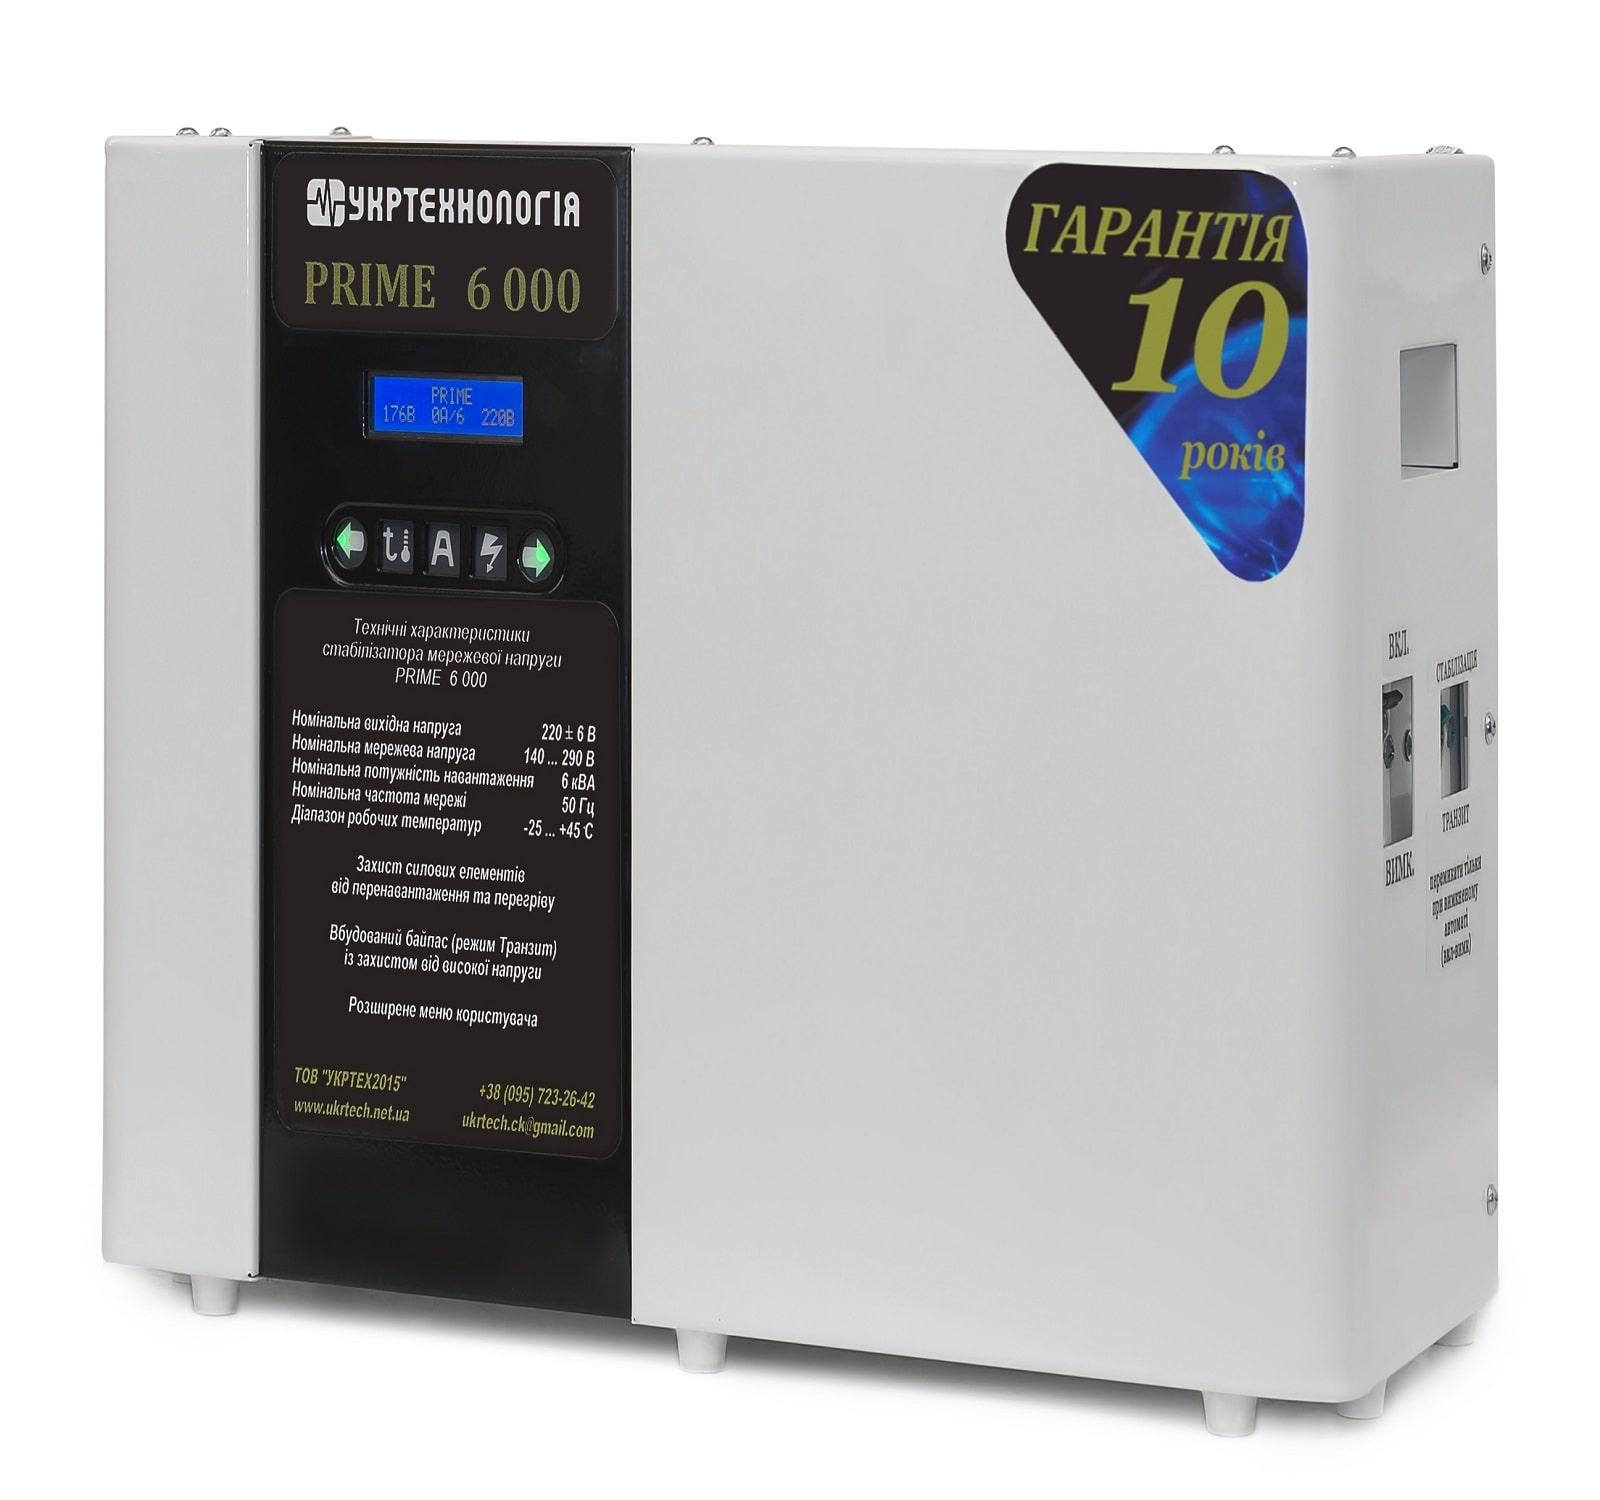 Стабилизаторы напряжения - Стабилизатор напряжения 6 кВт РRIME 000001453 - Фото 1